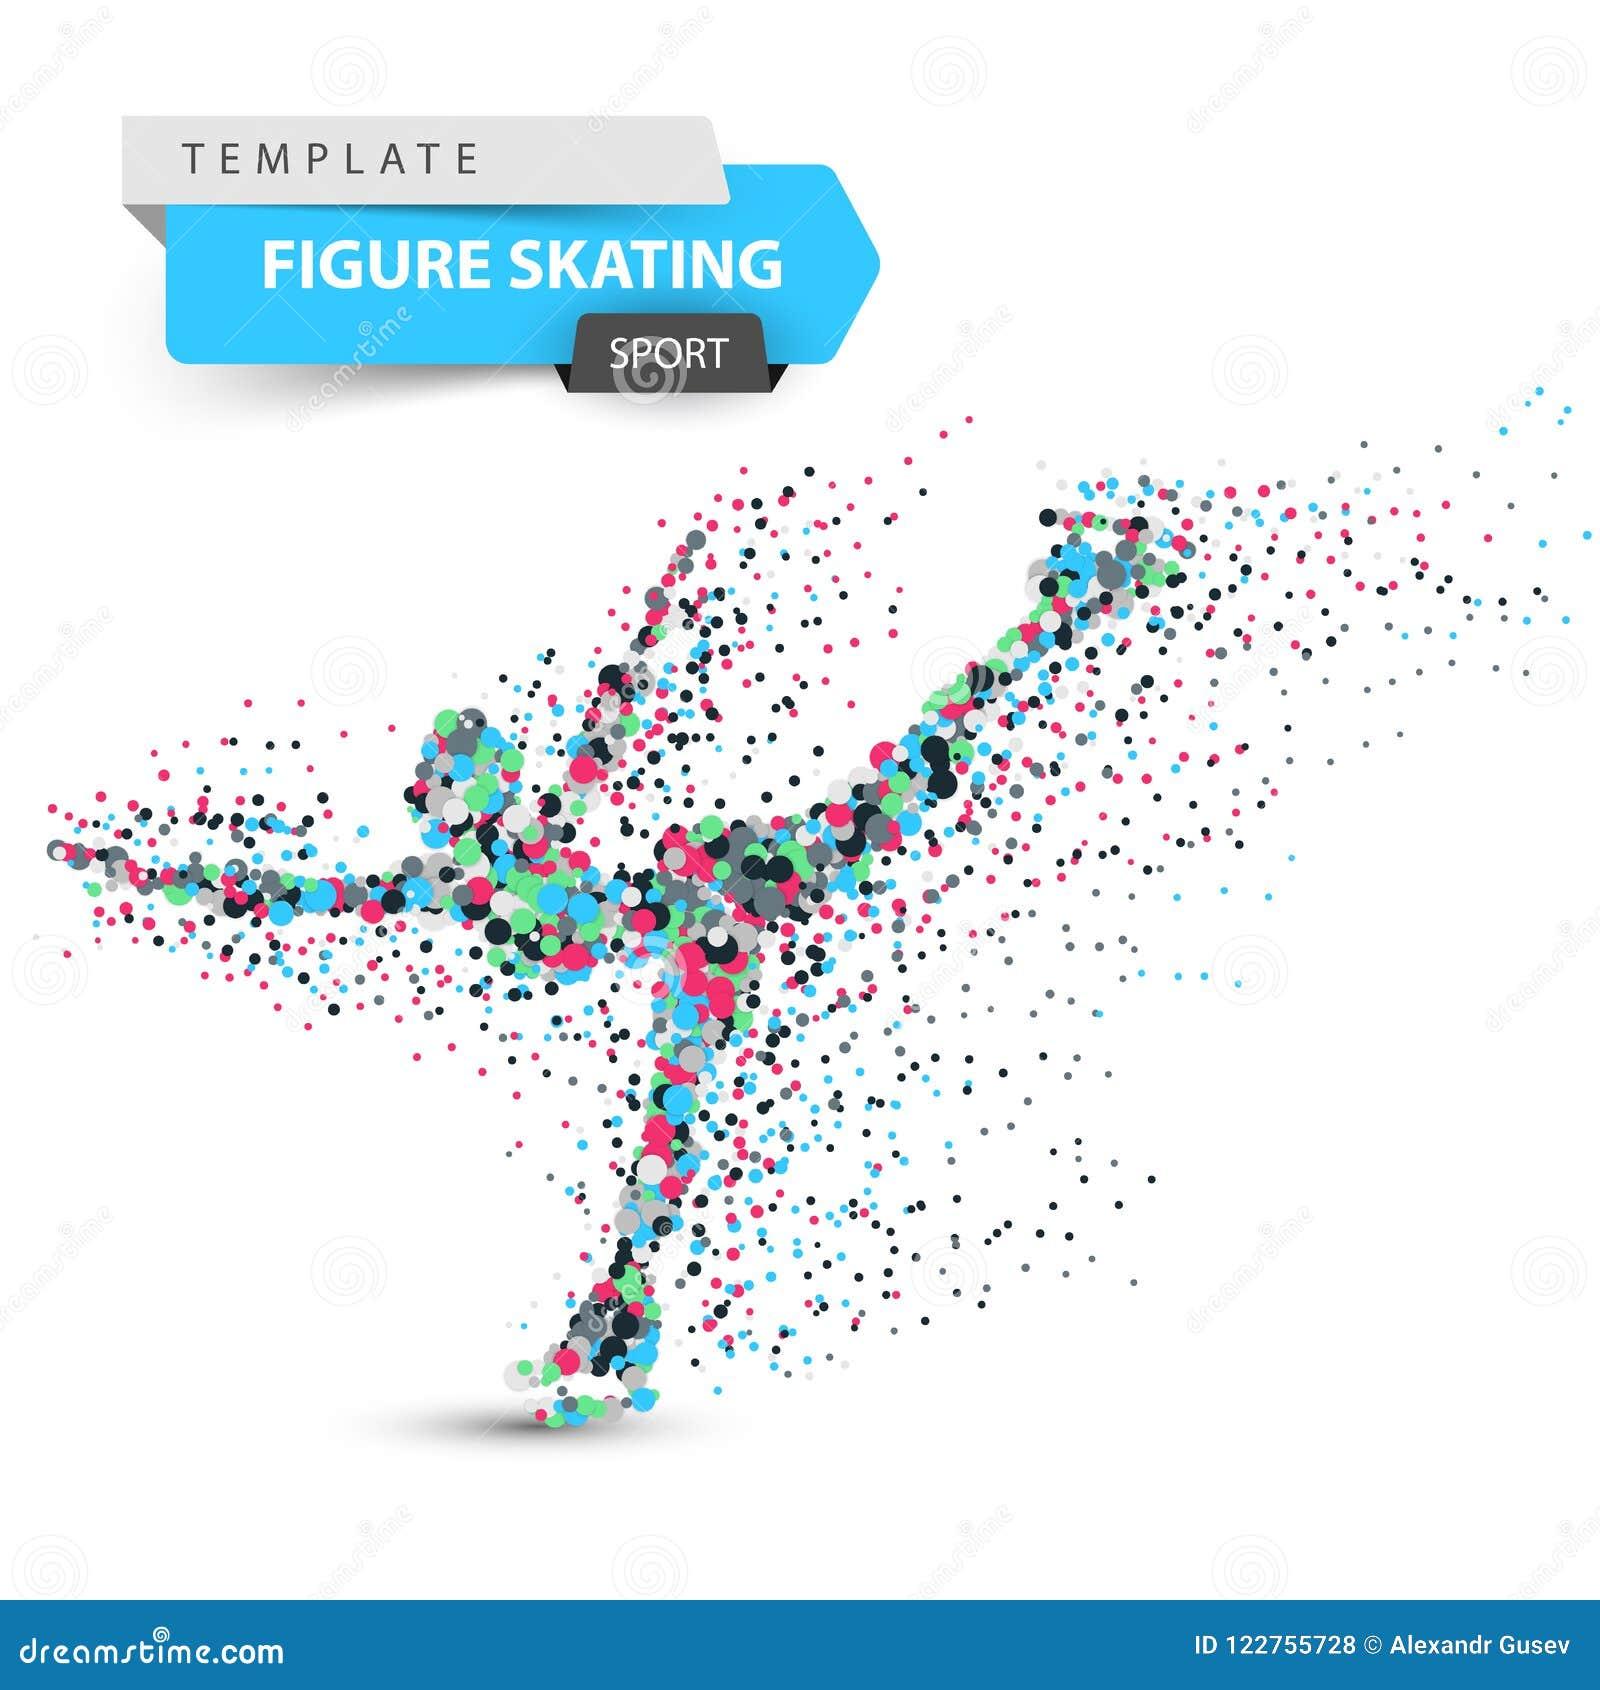 Figure skating - dot illustration. Sport template.